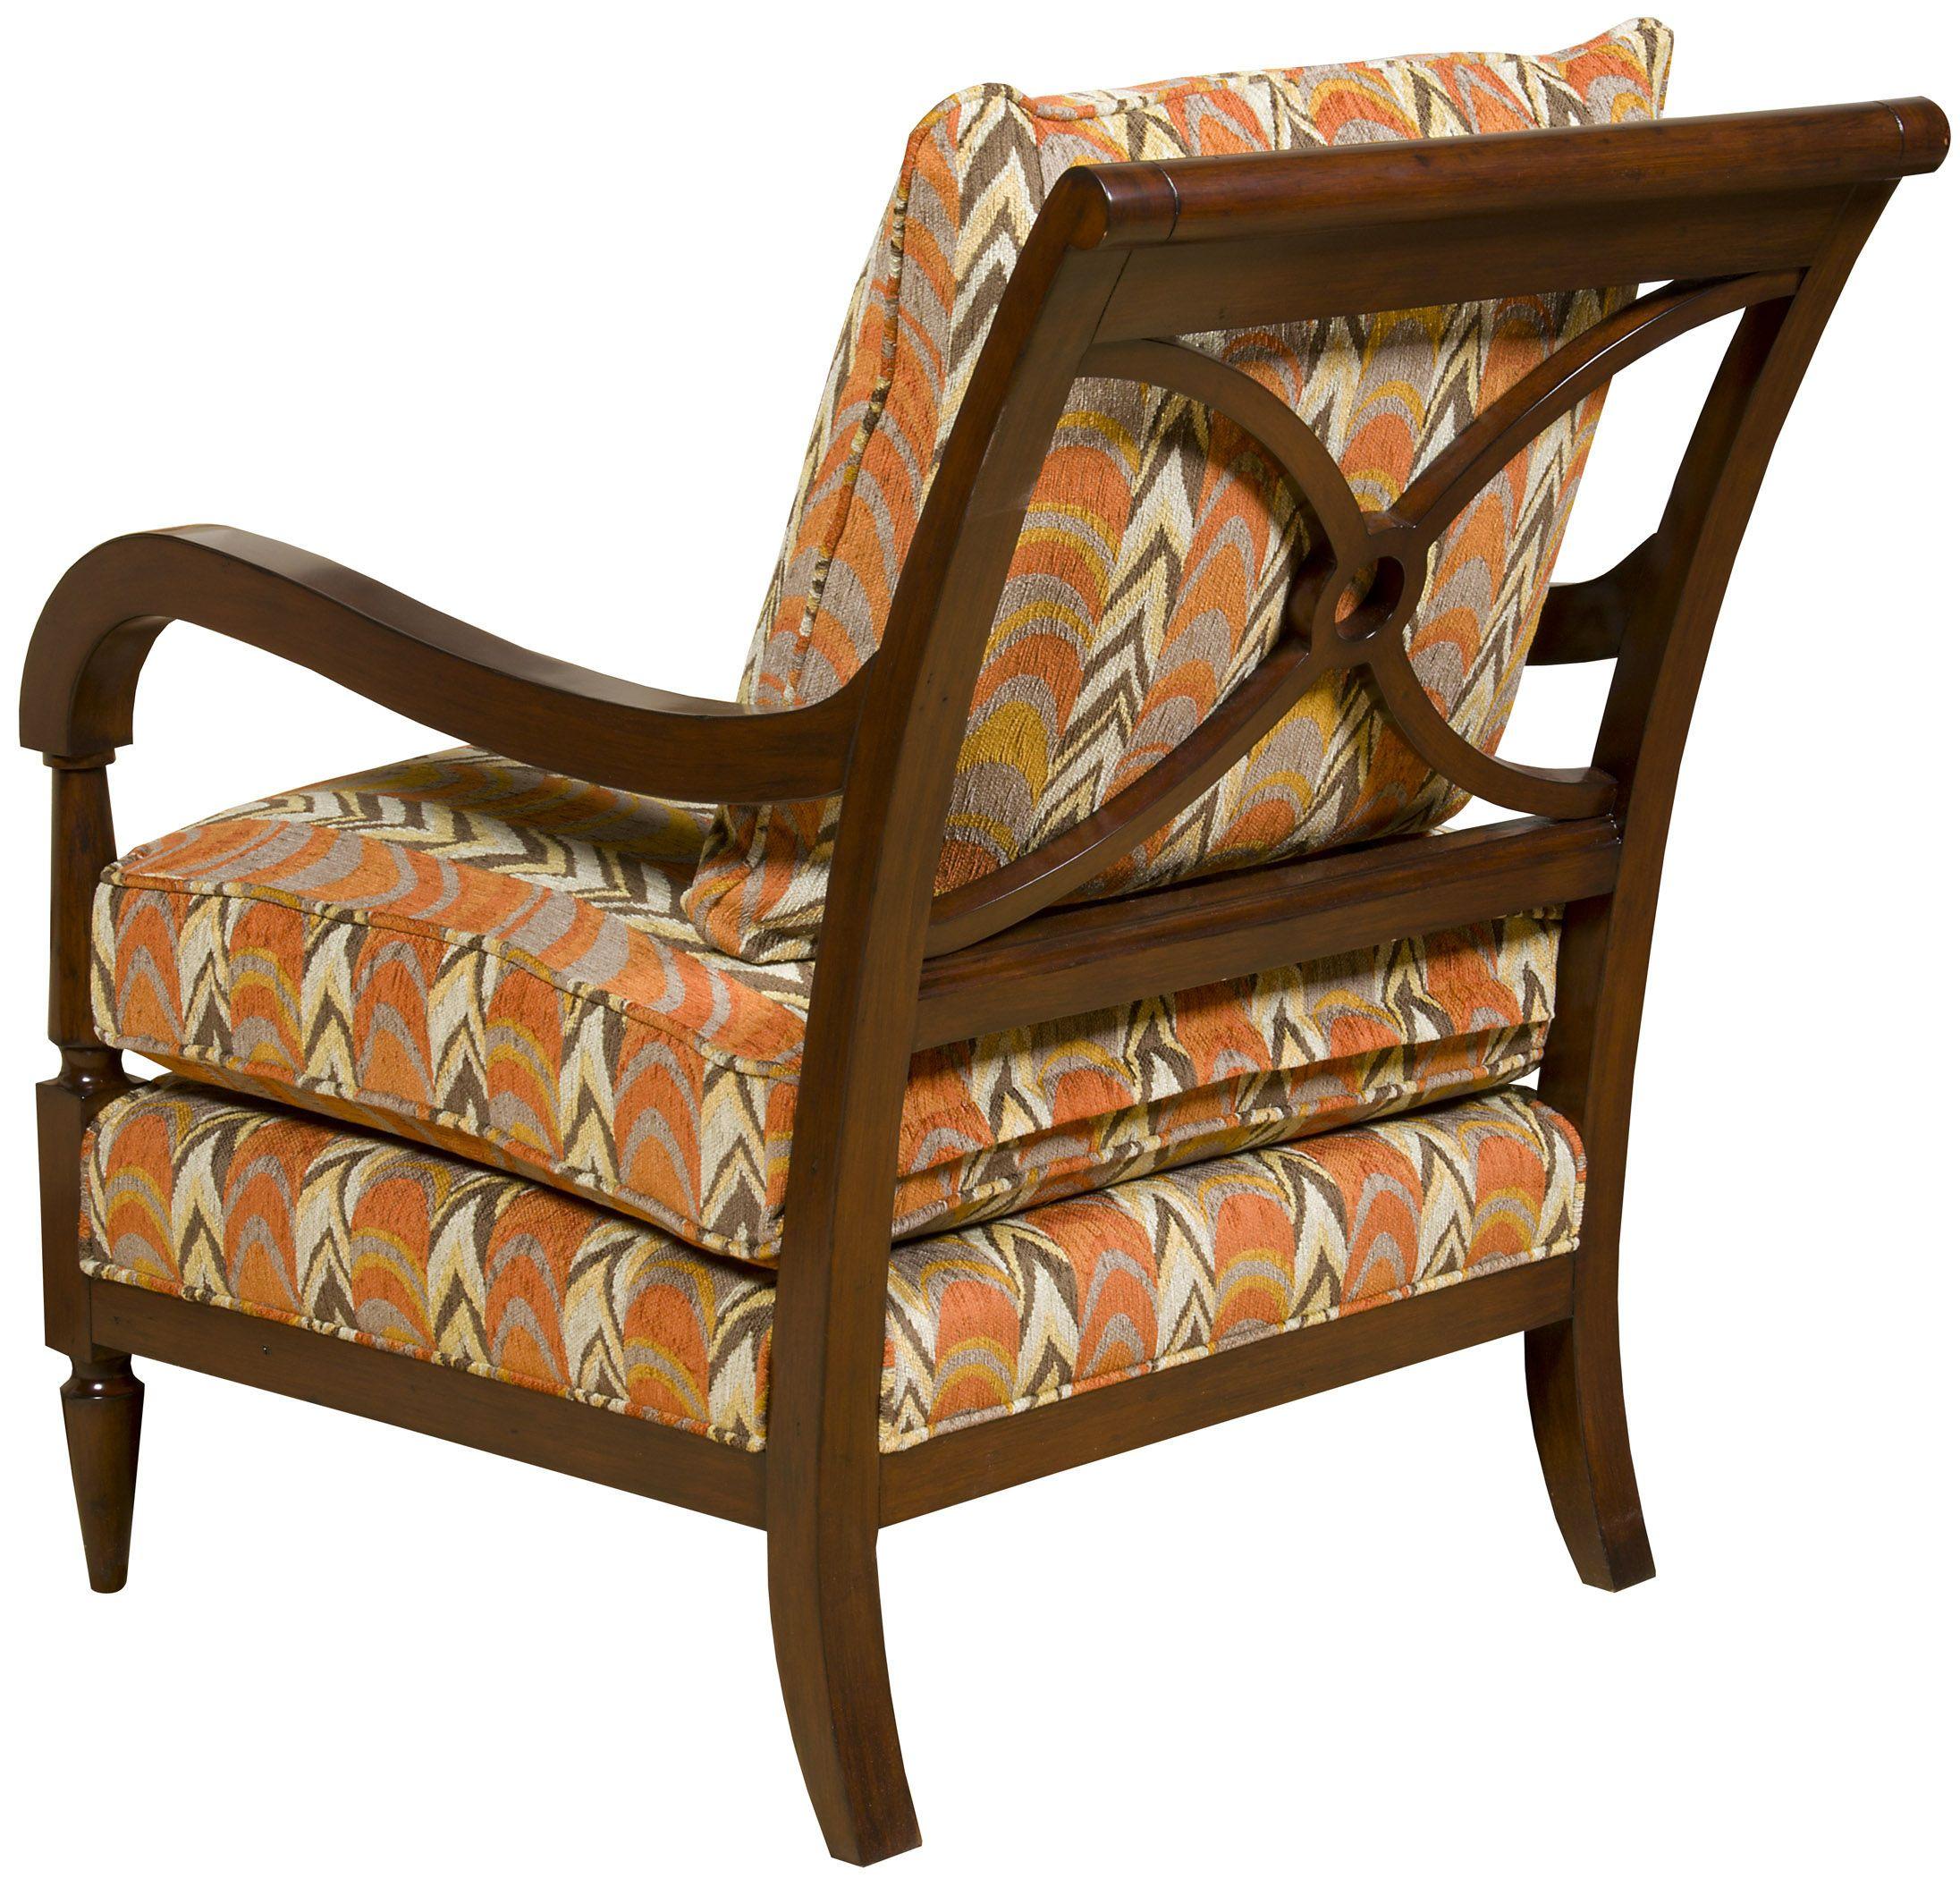 Vanguard Living Room Chair V321 CH   Vanguard Furniture   Conover, NC